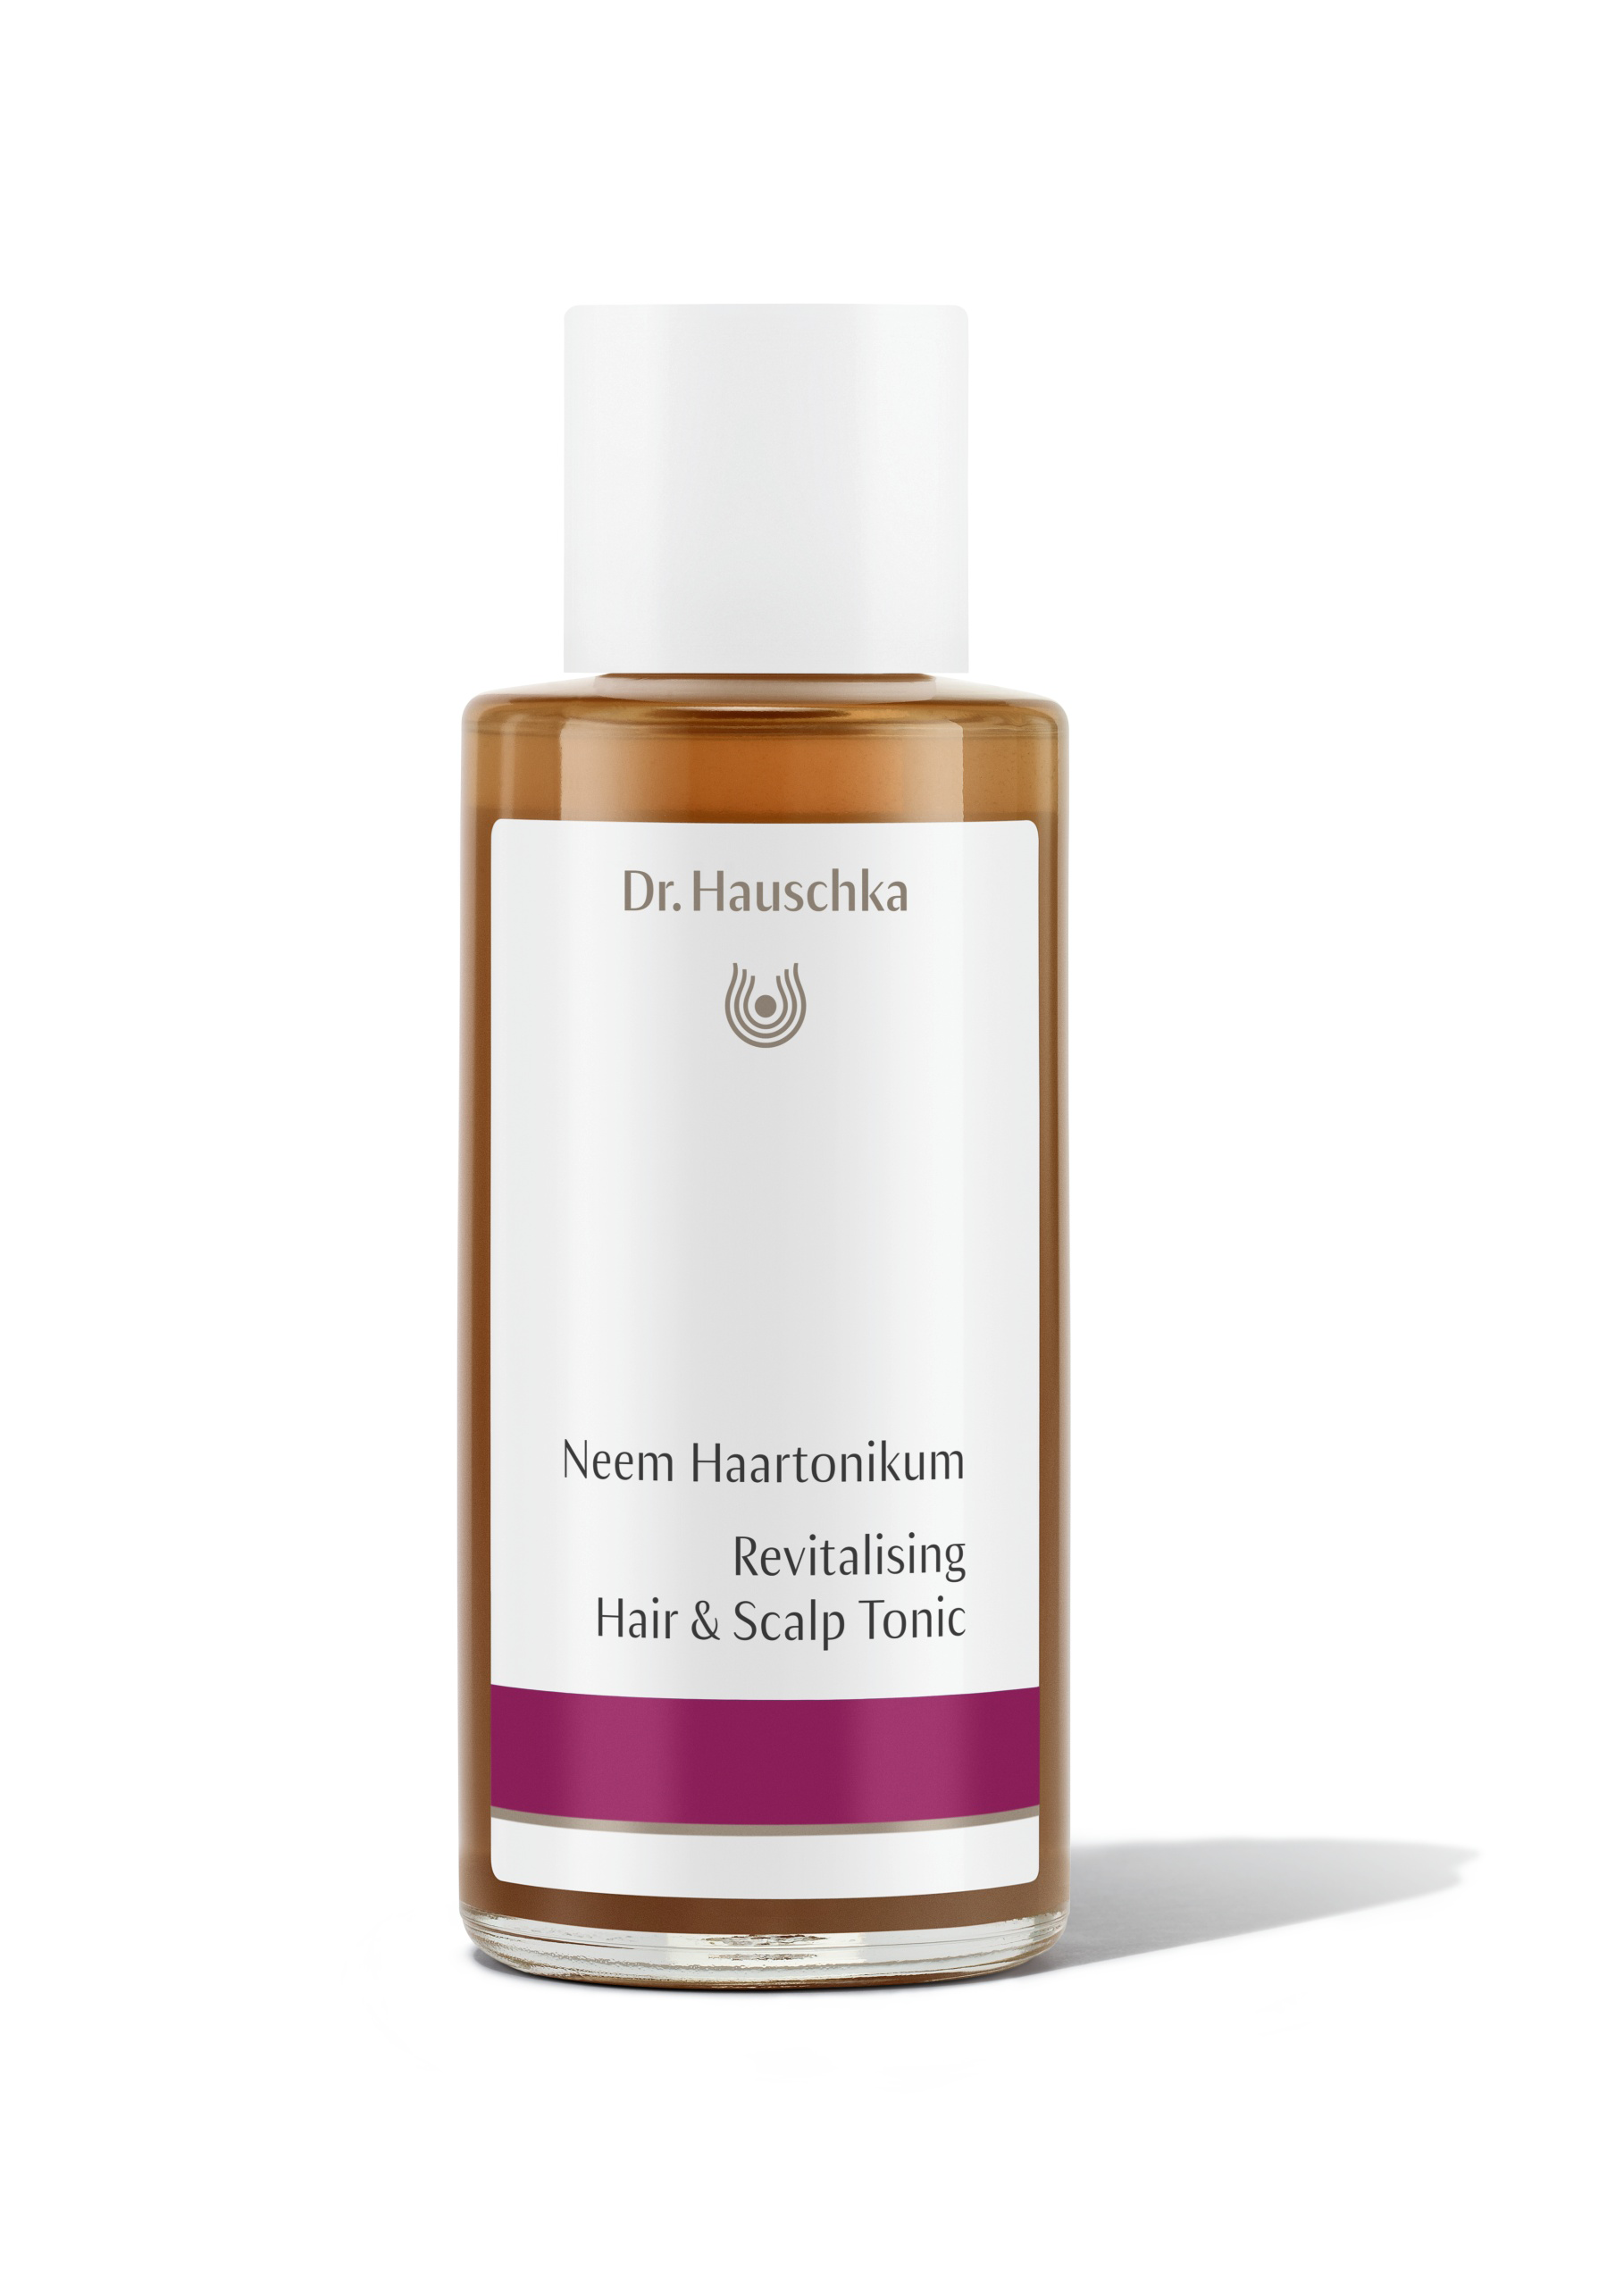 Dr. Hauschka Revitalising Hair & Scalp Tonic 100 ml